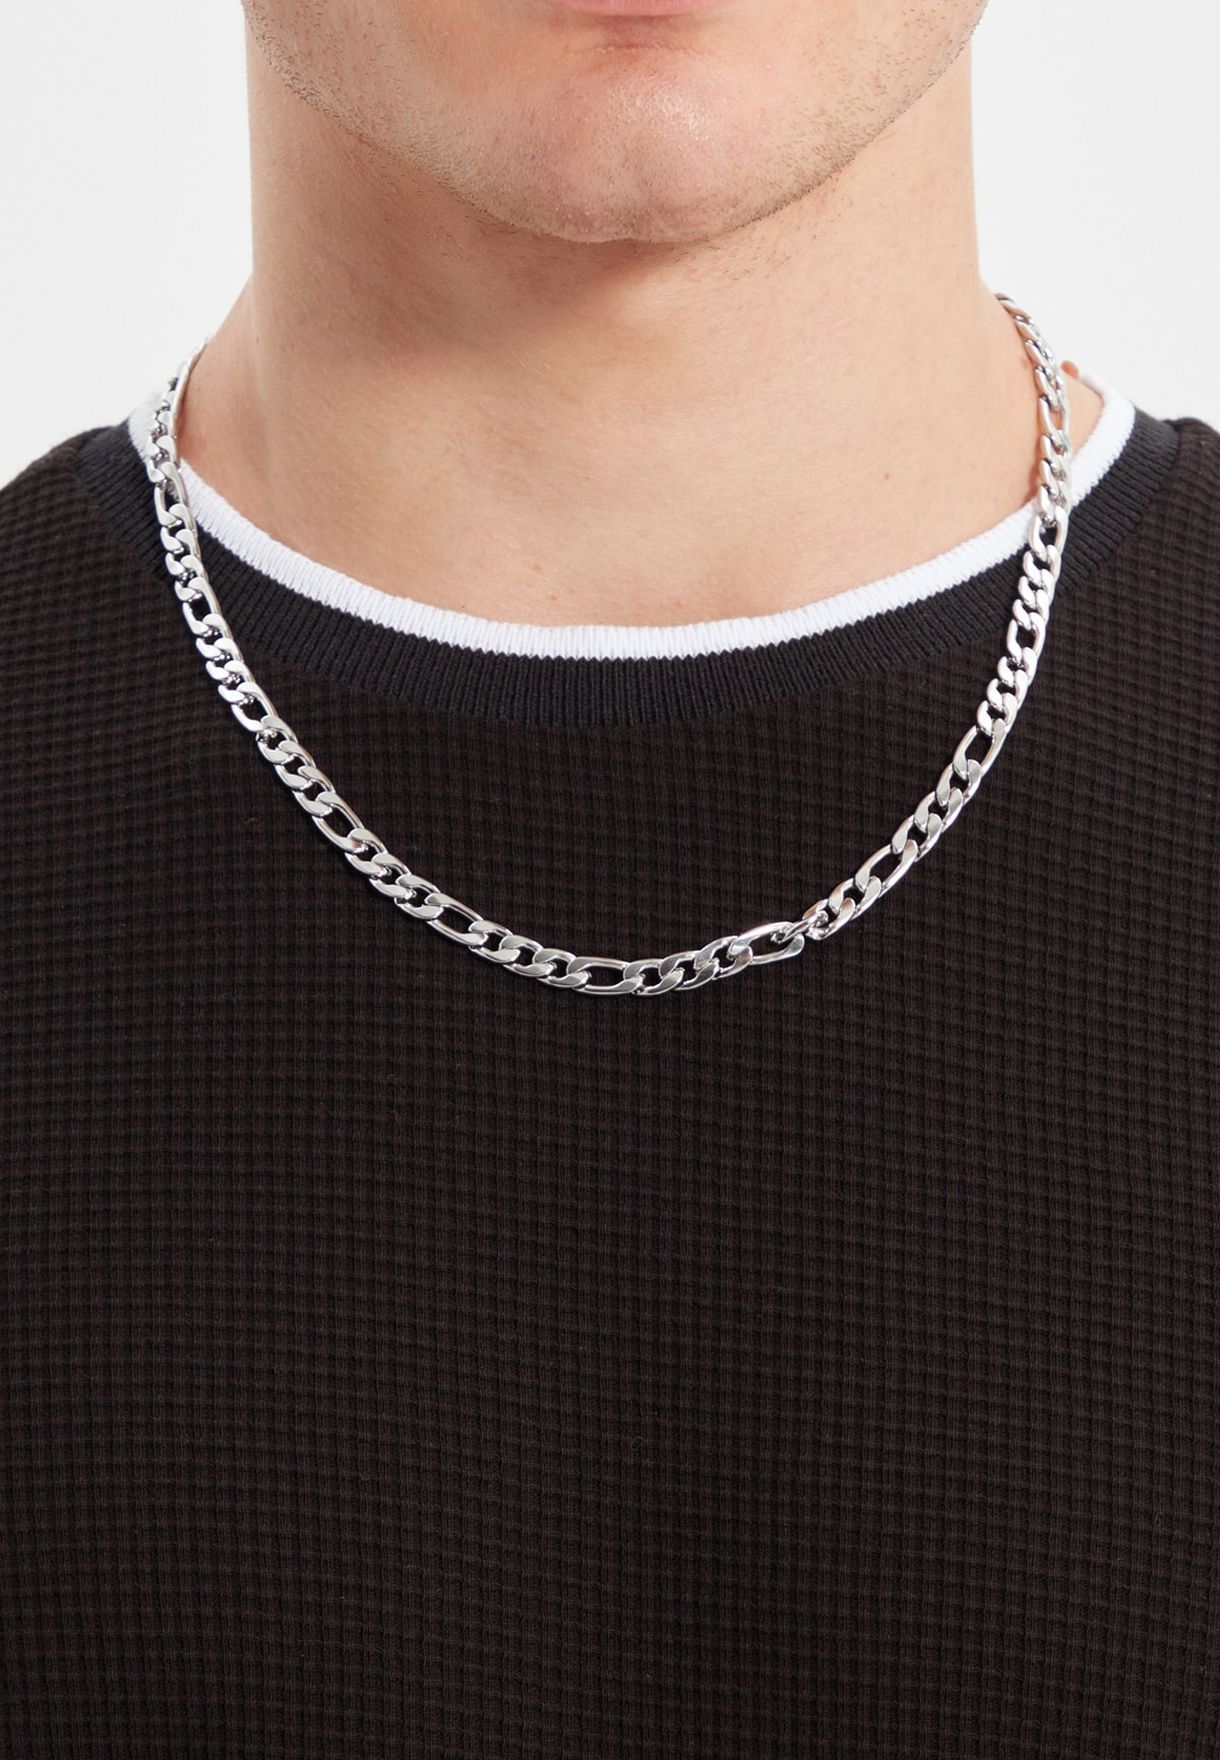 Link Chain Necklace & Beaded Bracelet Set